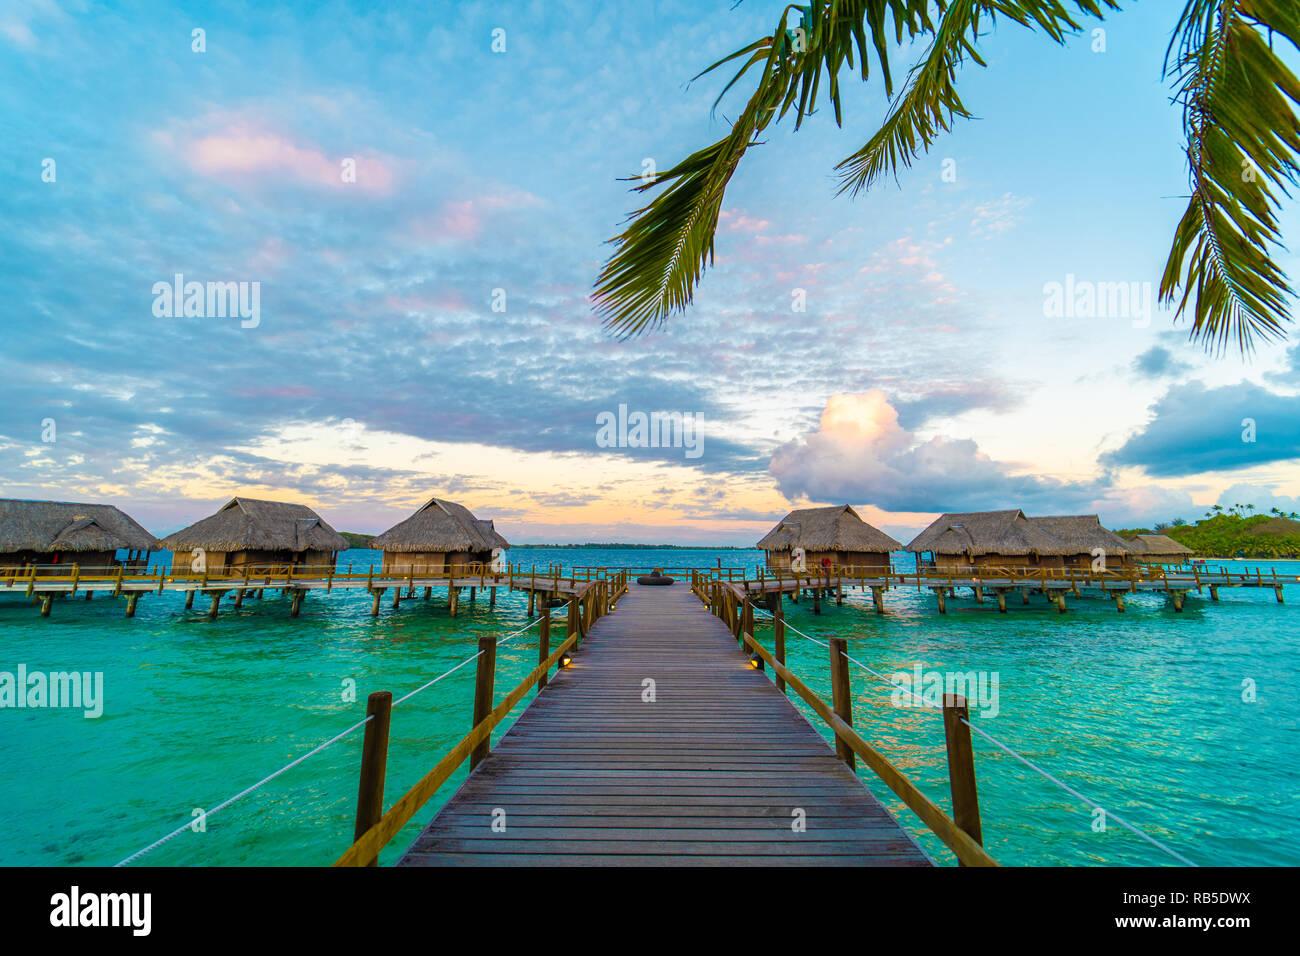 Way to overwater bungalow on a side island of Bora Bora, Tahiti - Stock Image